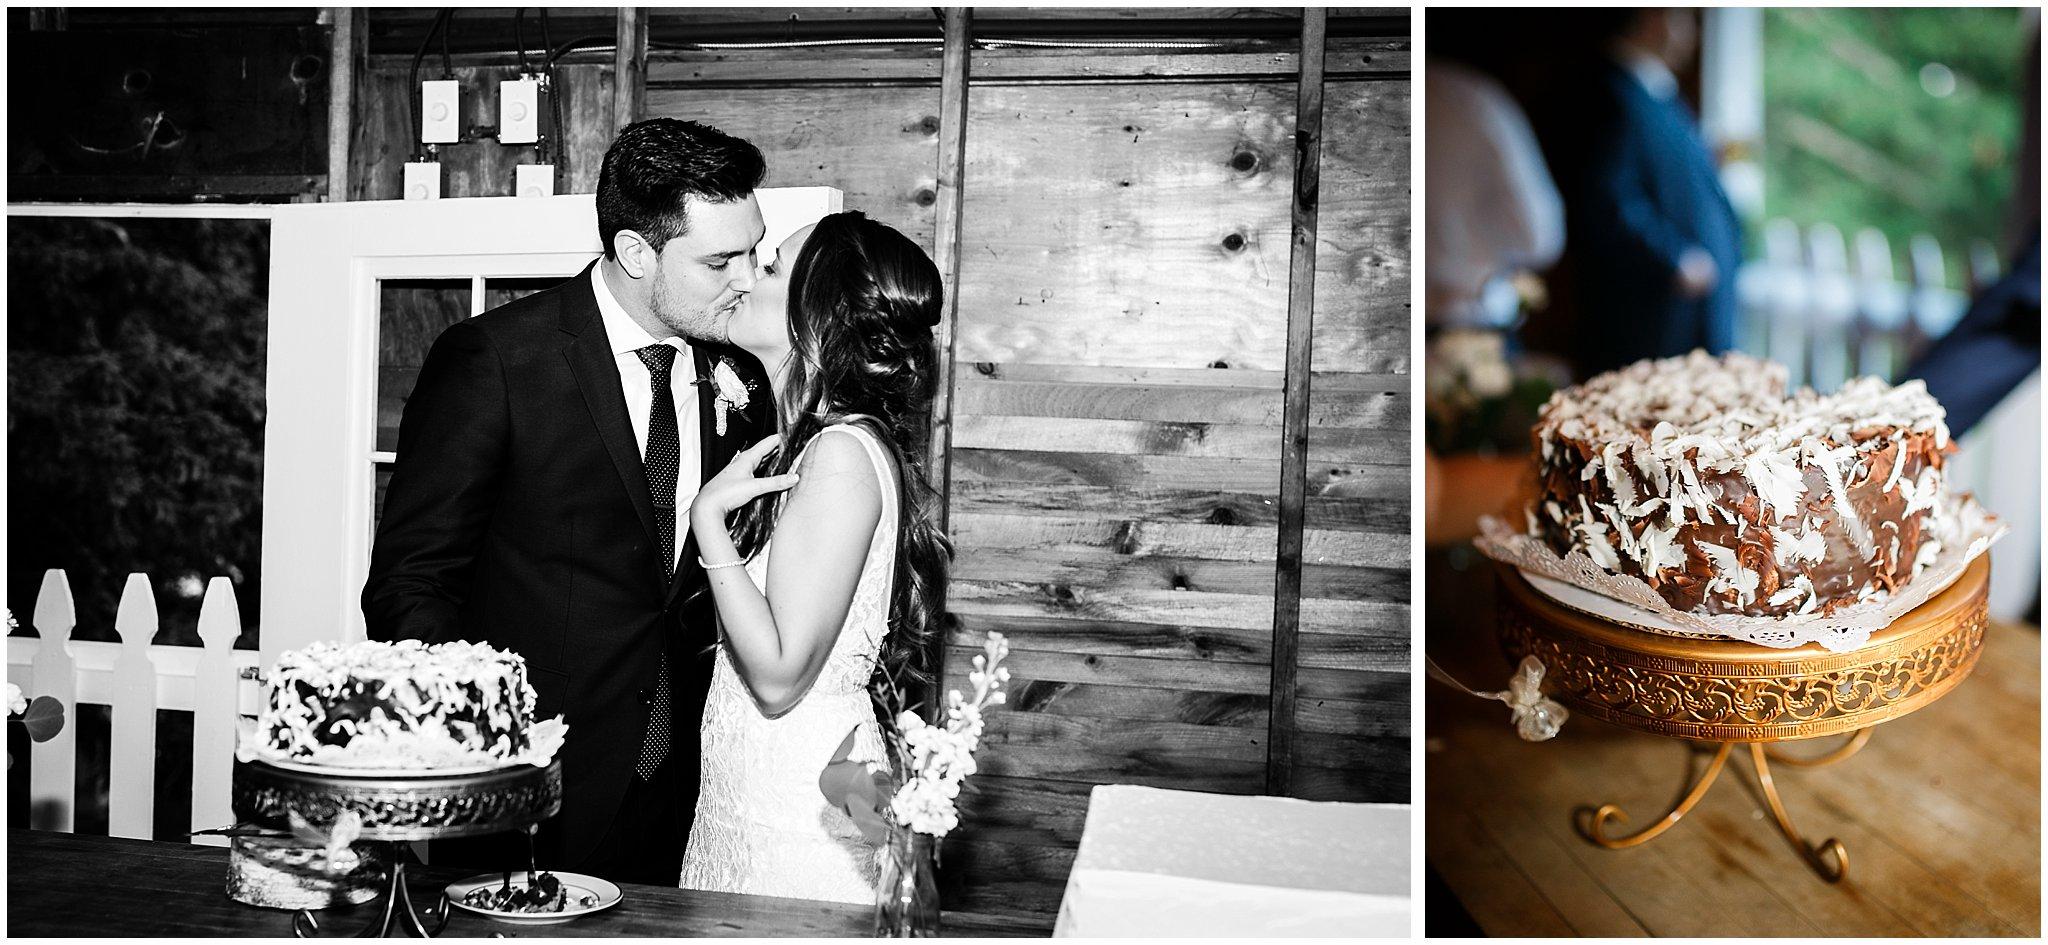 Hudson Valley Weddings at the Hill Hudson New York Wedding Photographer96.jpg